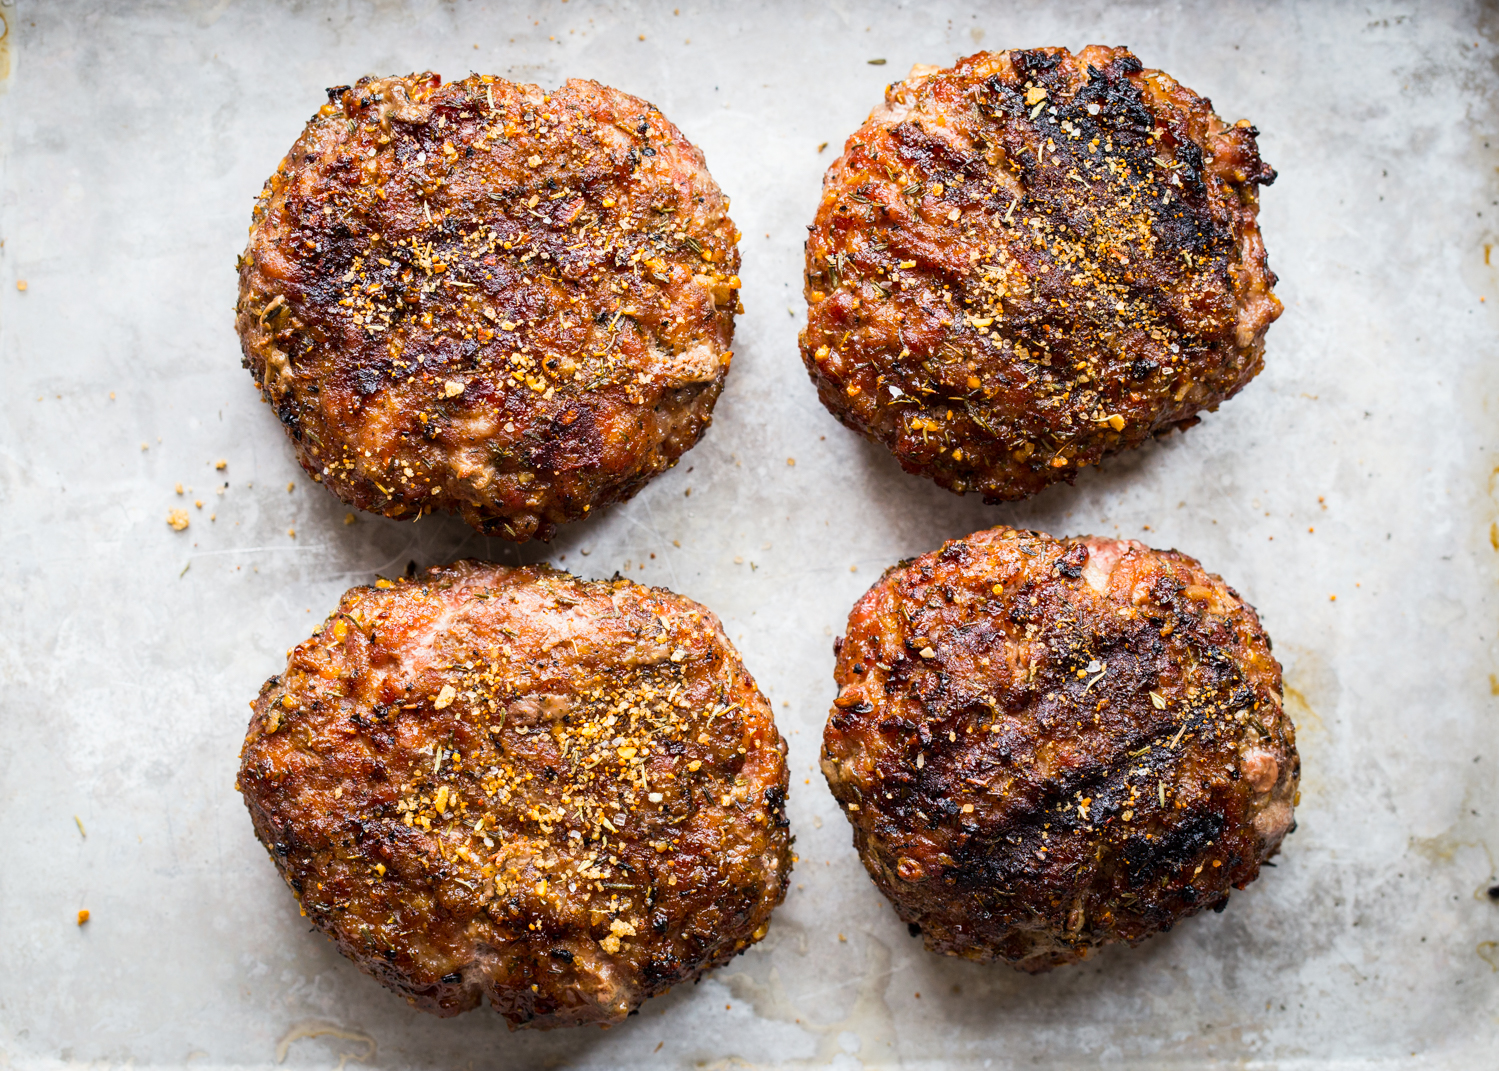 Smoky Maple & Sage Breakfast Pork Burgers made with ground pork and a kicking' seasoning rub!